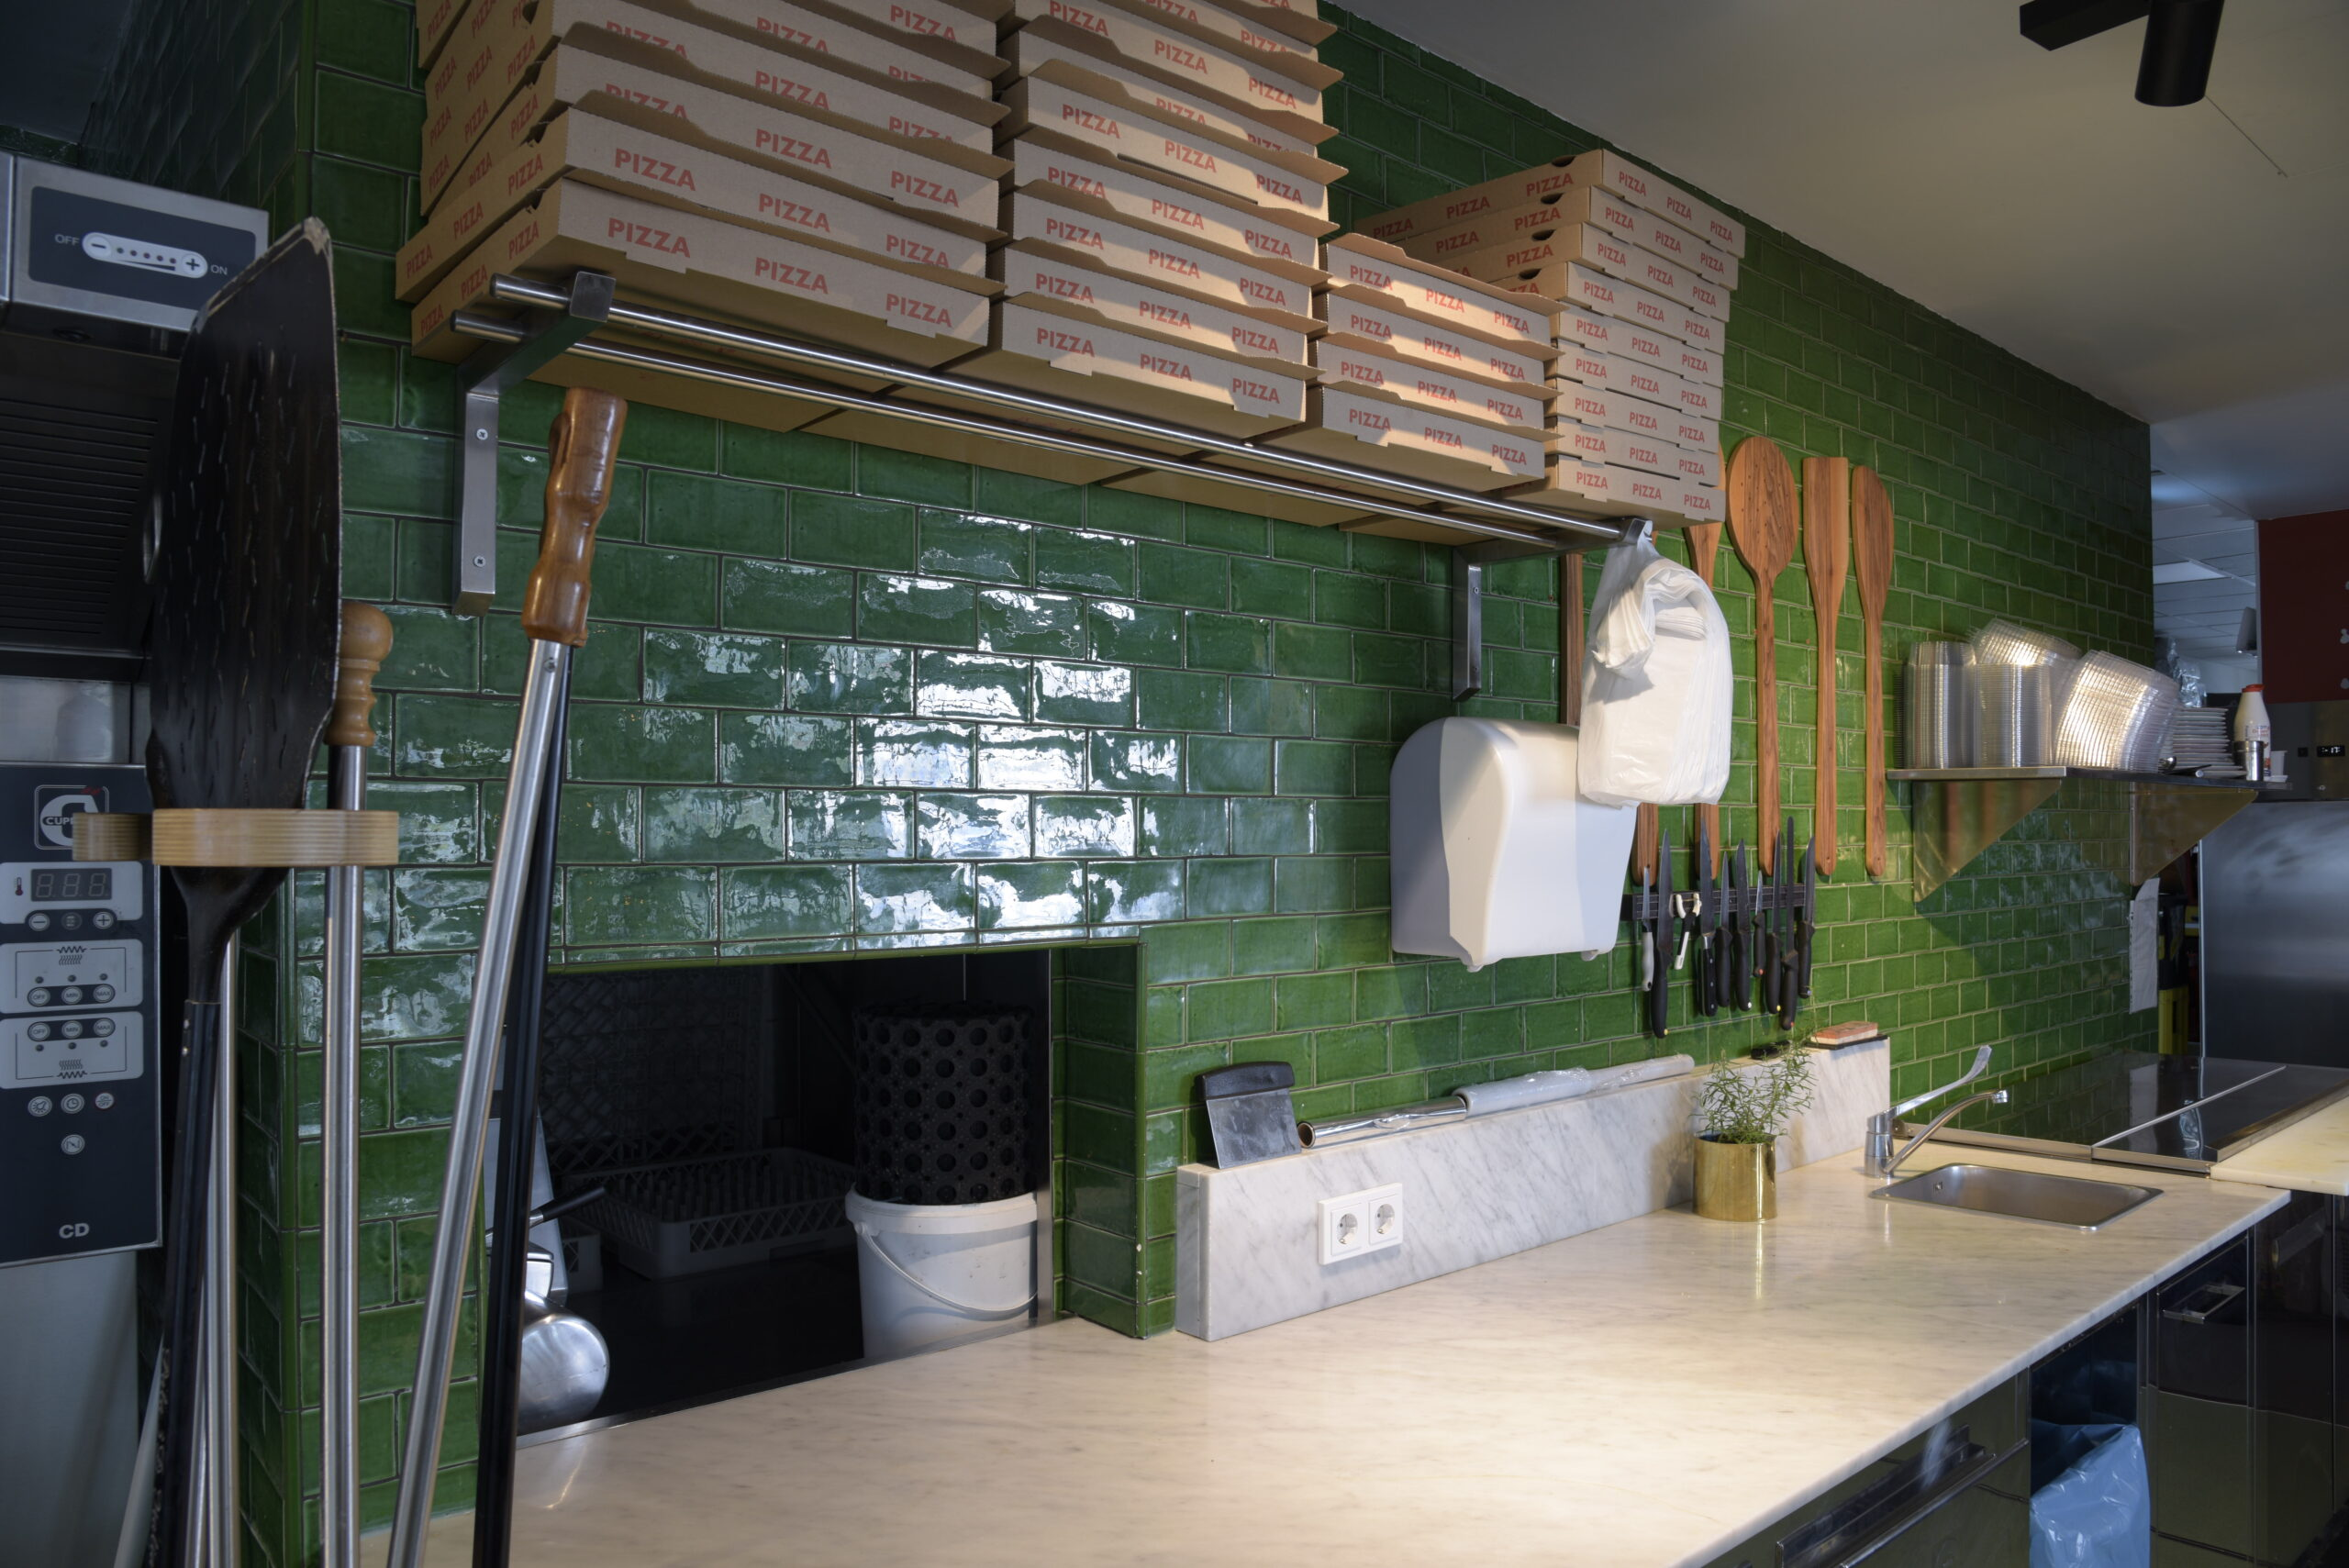 Arredamenti per Pizzerie - Coletti